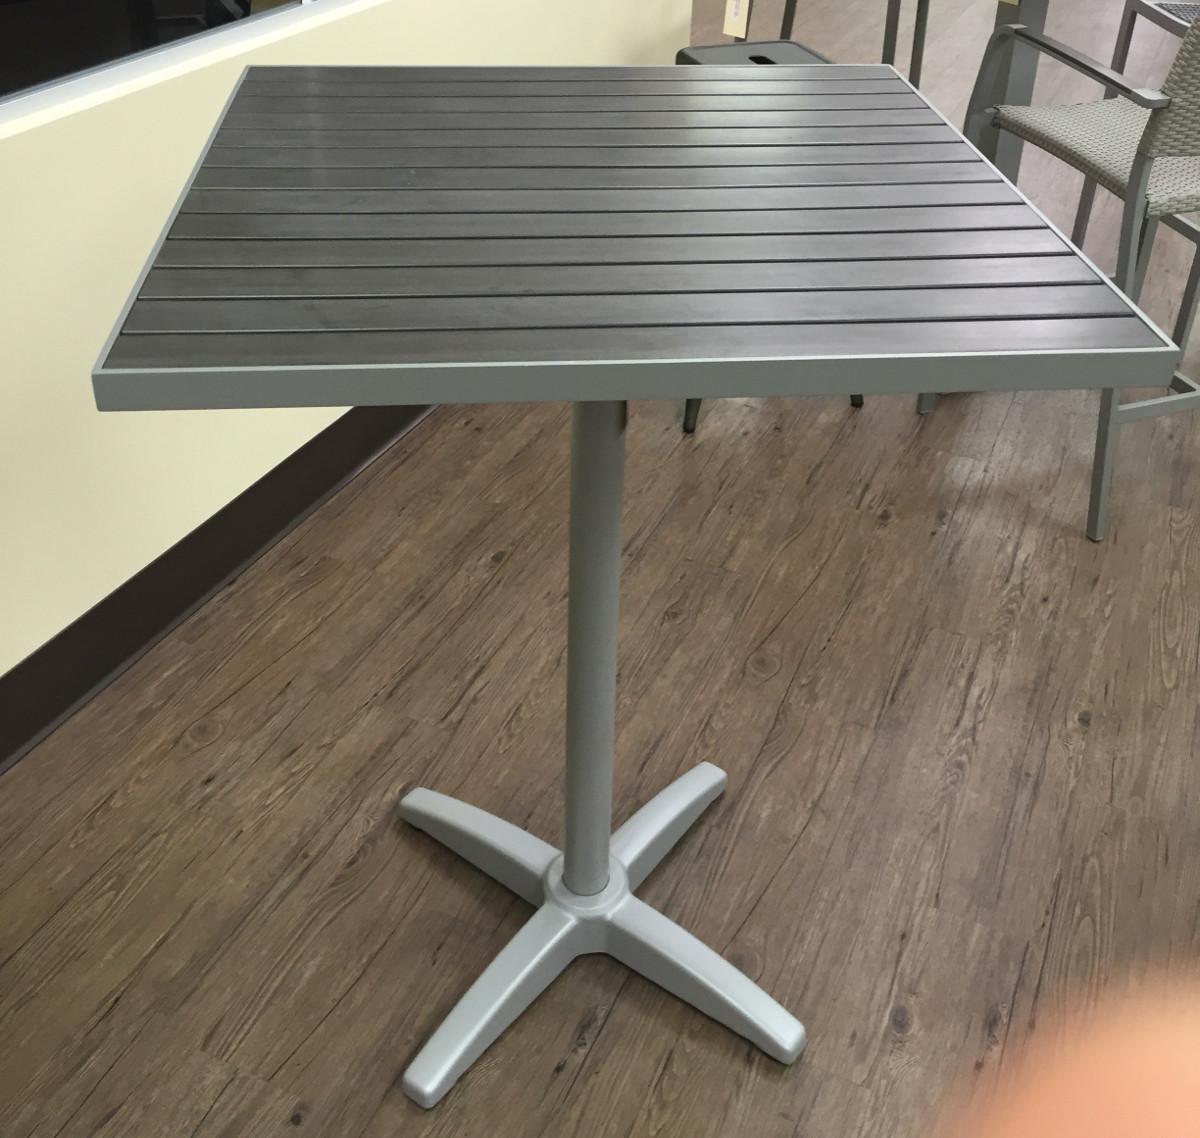 Square Patina Gray Teak Resin Patio Table W Silver Frame